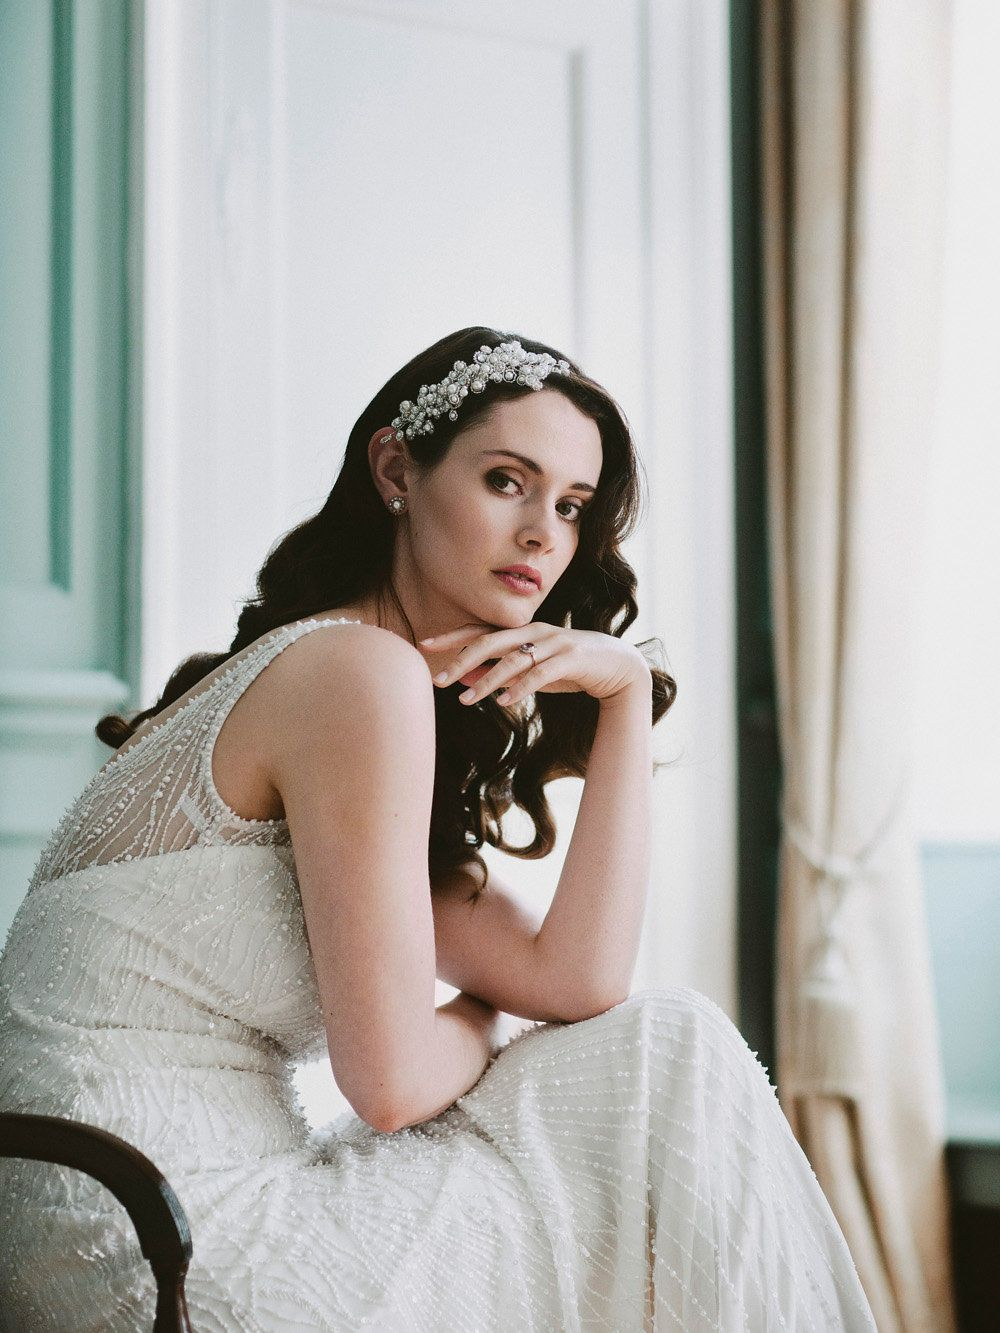 cd9dddbef48 Bride Bridal Dress Gown Beaded 1930s Hairpiece Glamorous Vintage Eggington  House Wedding Ideas David Jenkins Photography #wedding #Bride #Bridal  #Beaded ...